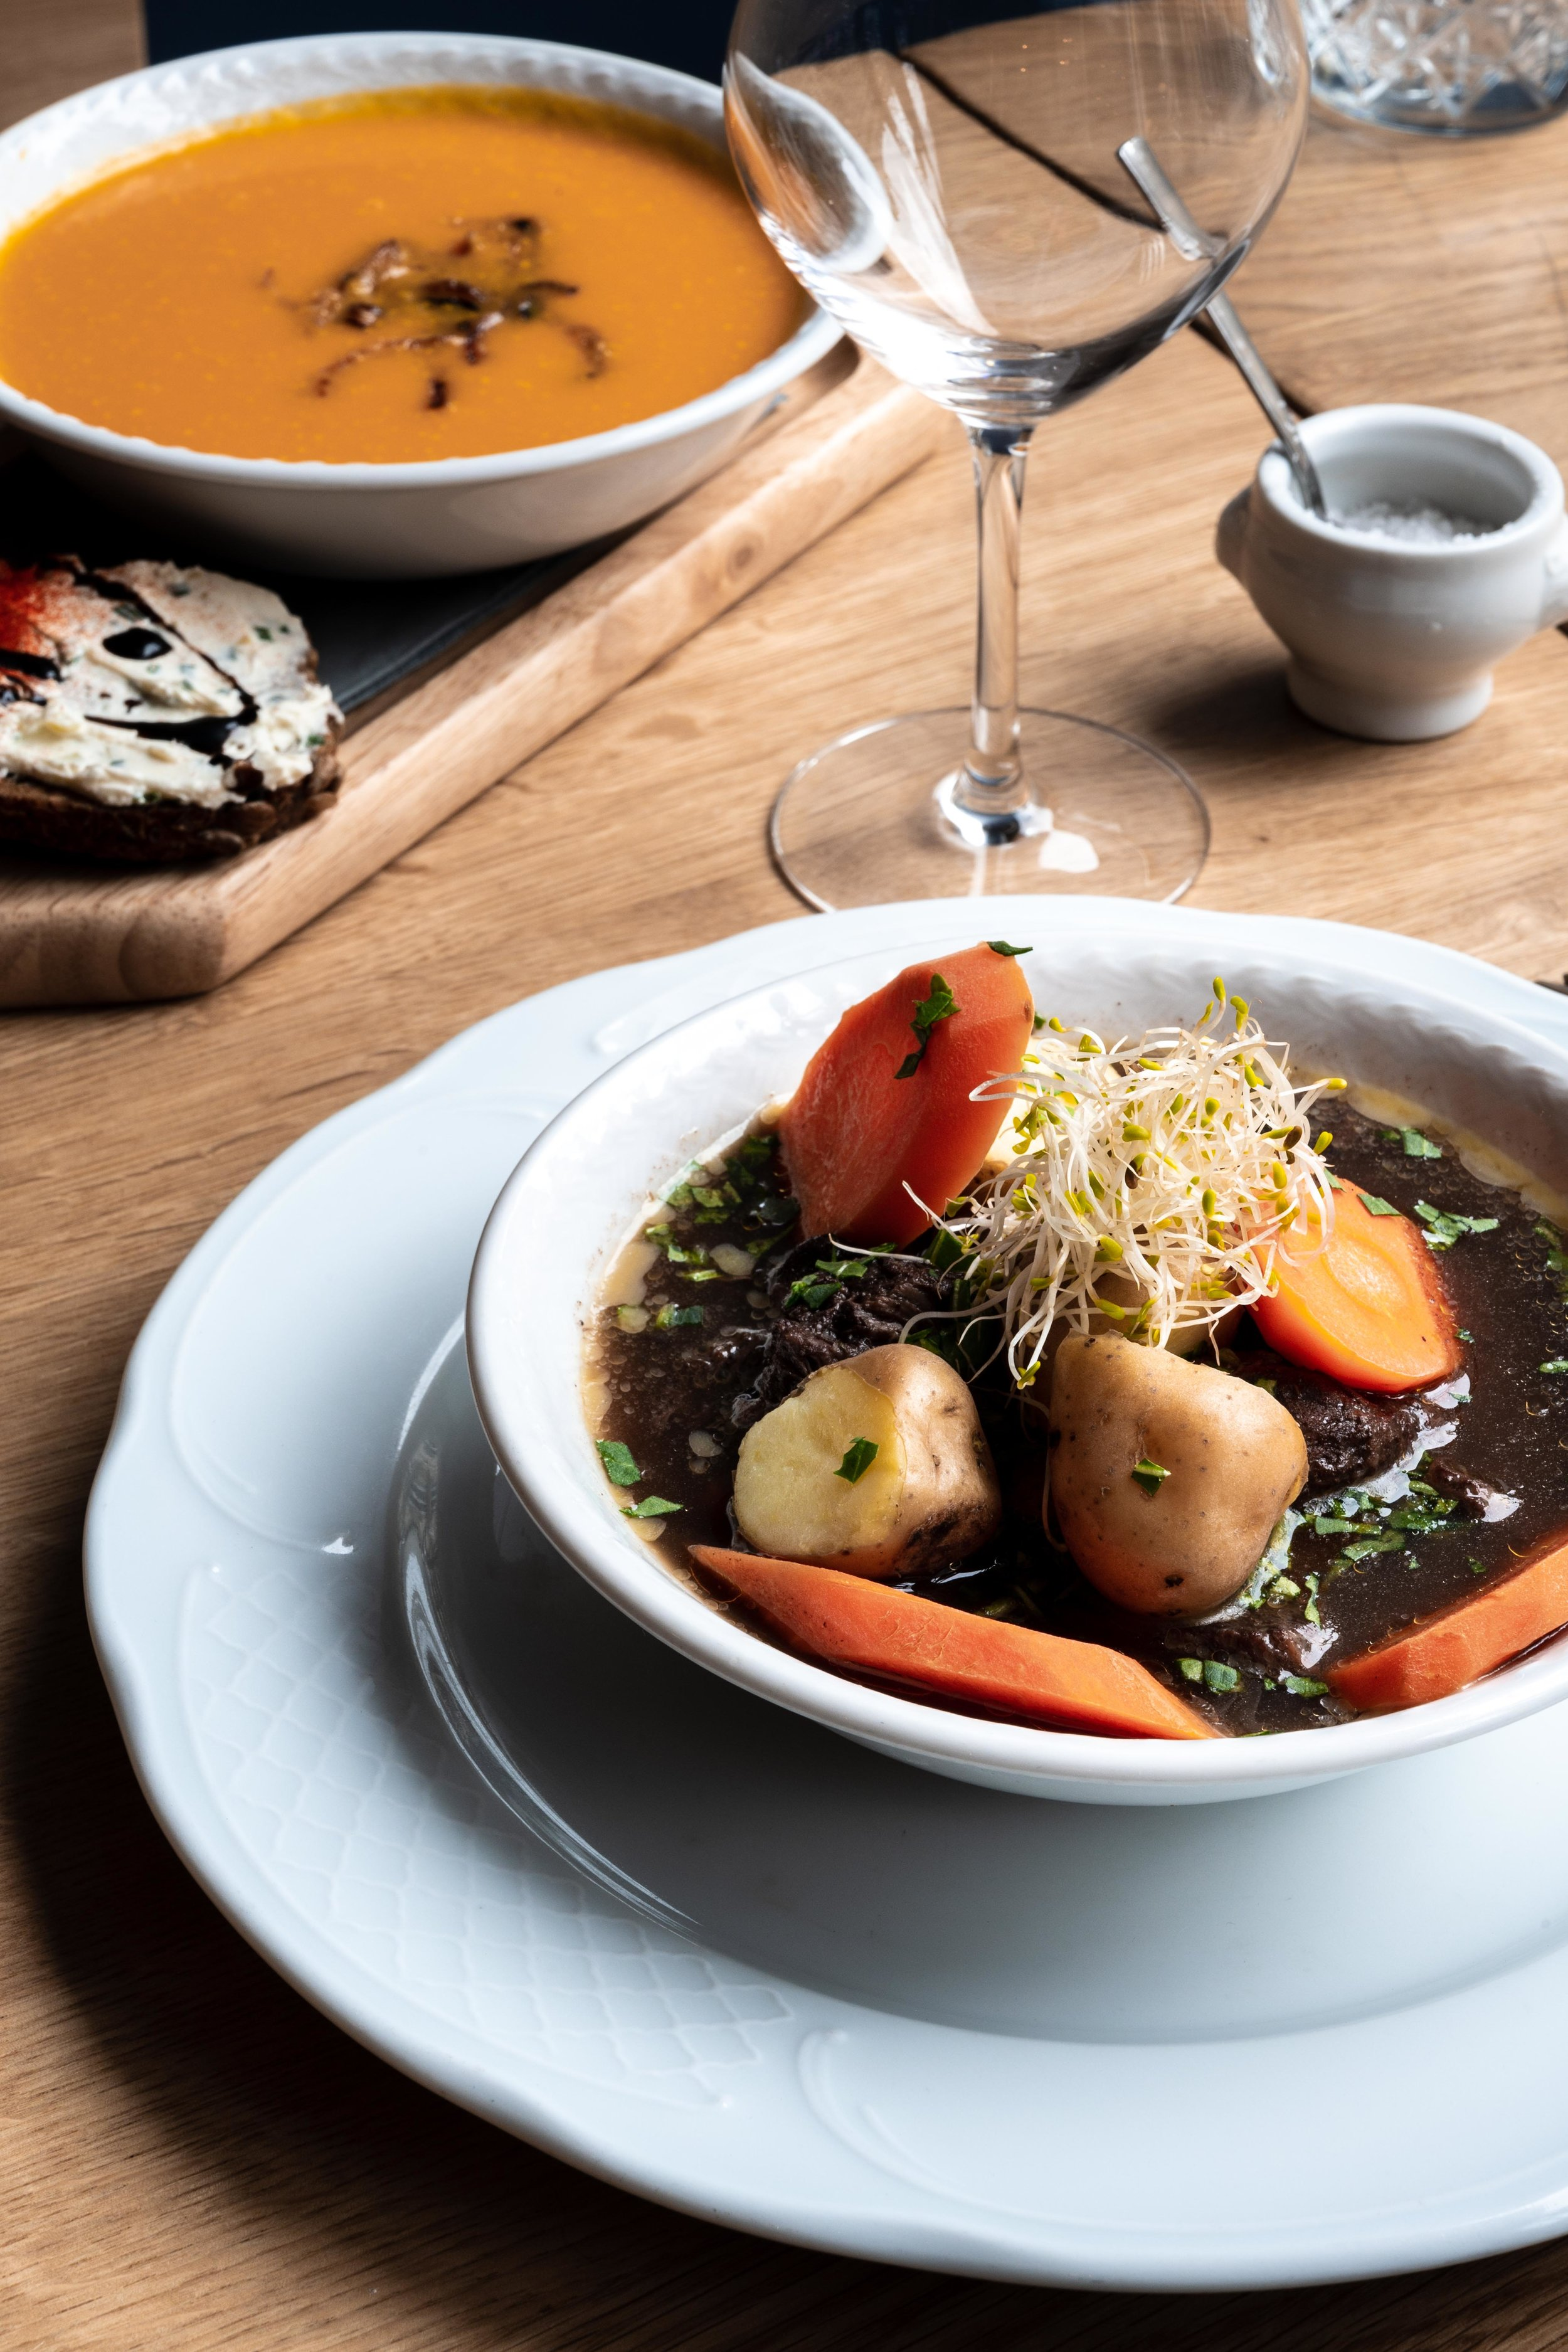 Jacques_Restaurant_by©Edouard_Auffray-Benjamin_Konrad Food 2-2-7.JPG